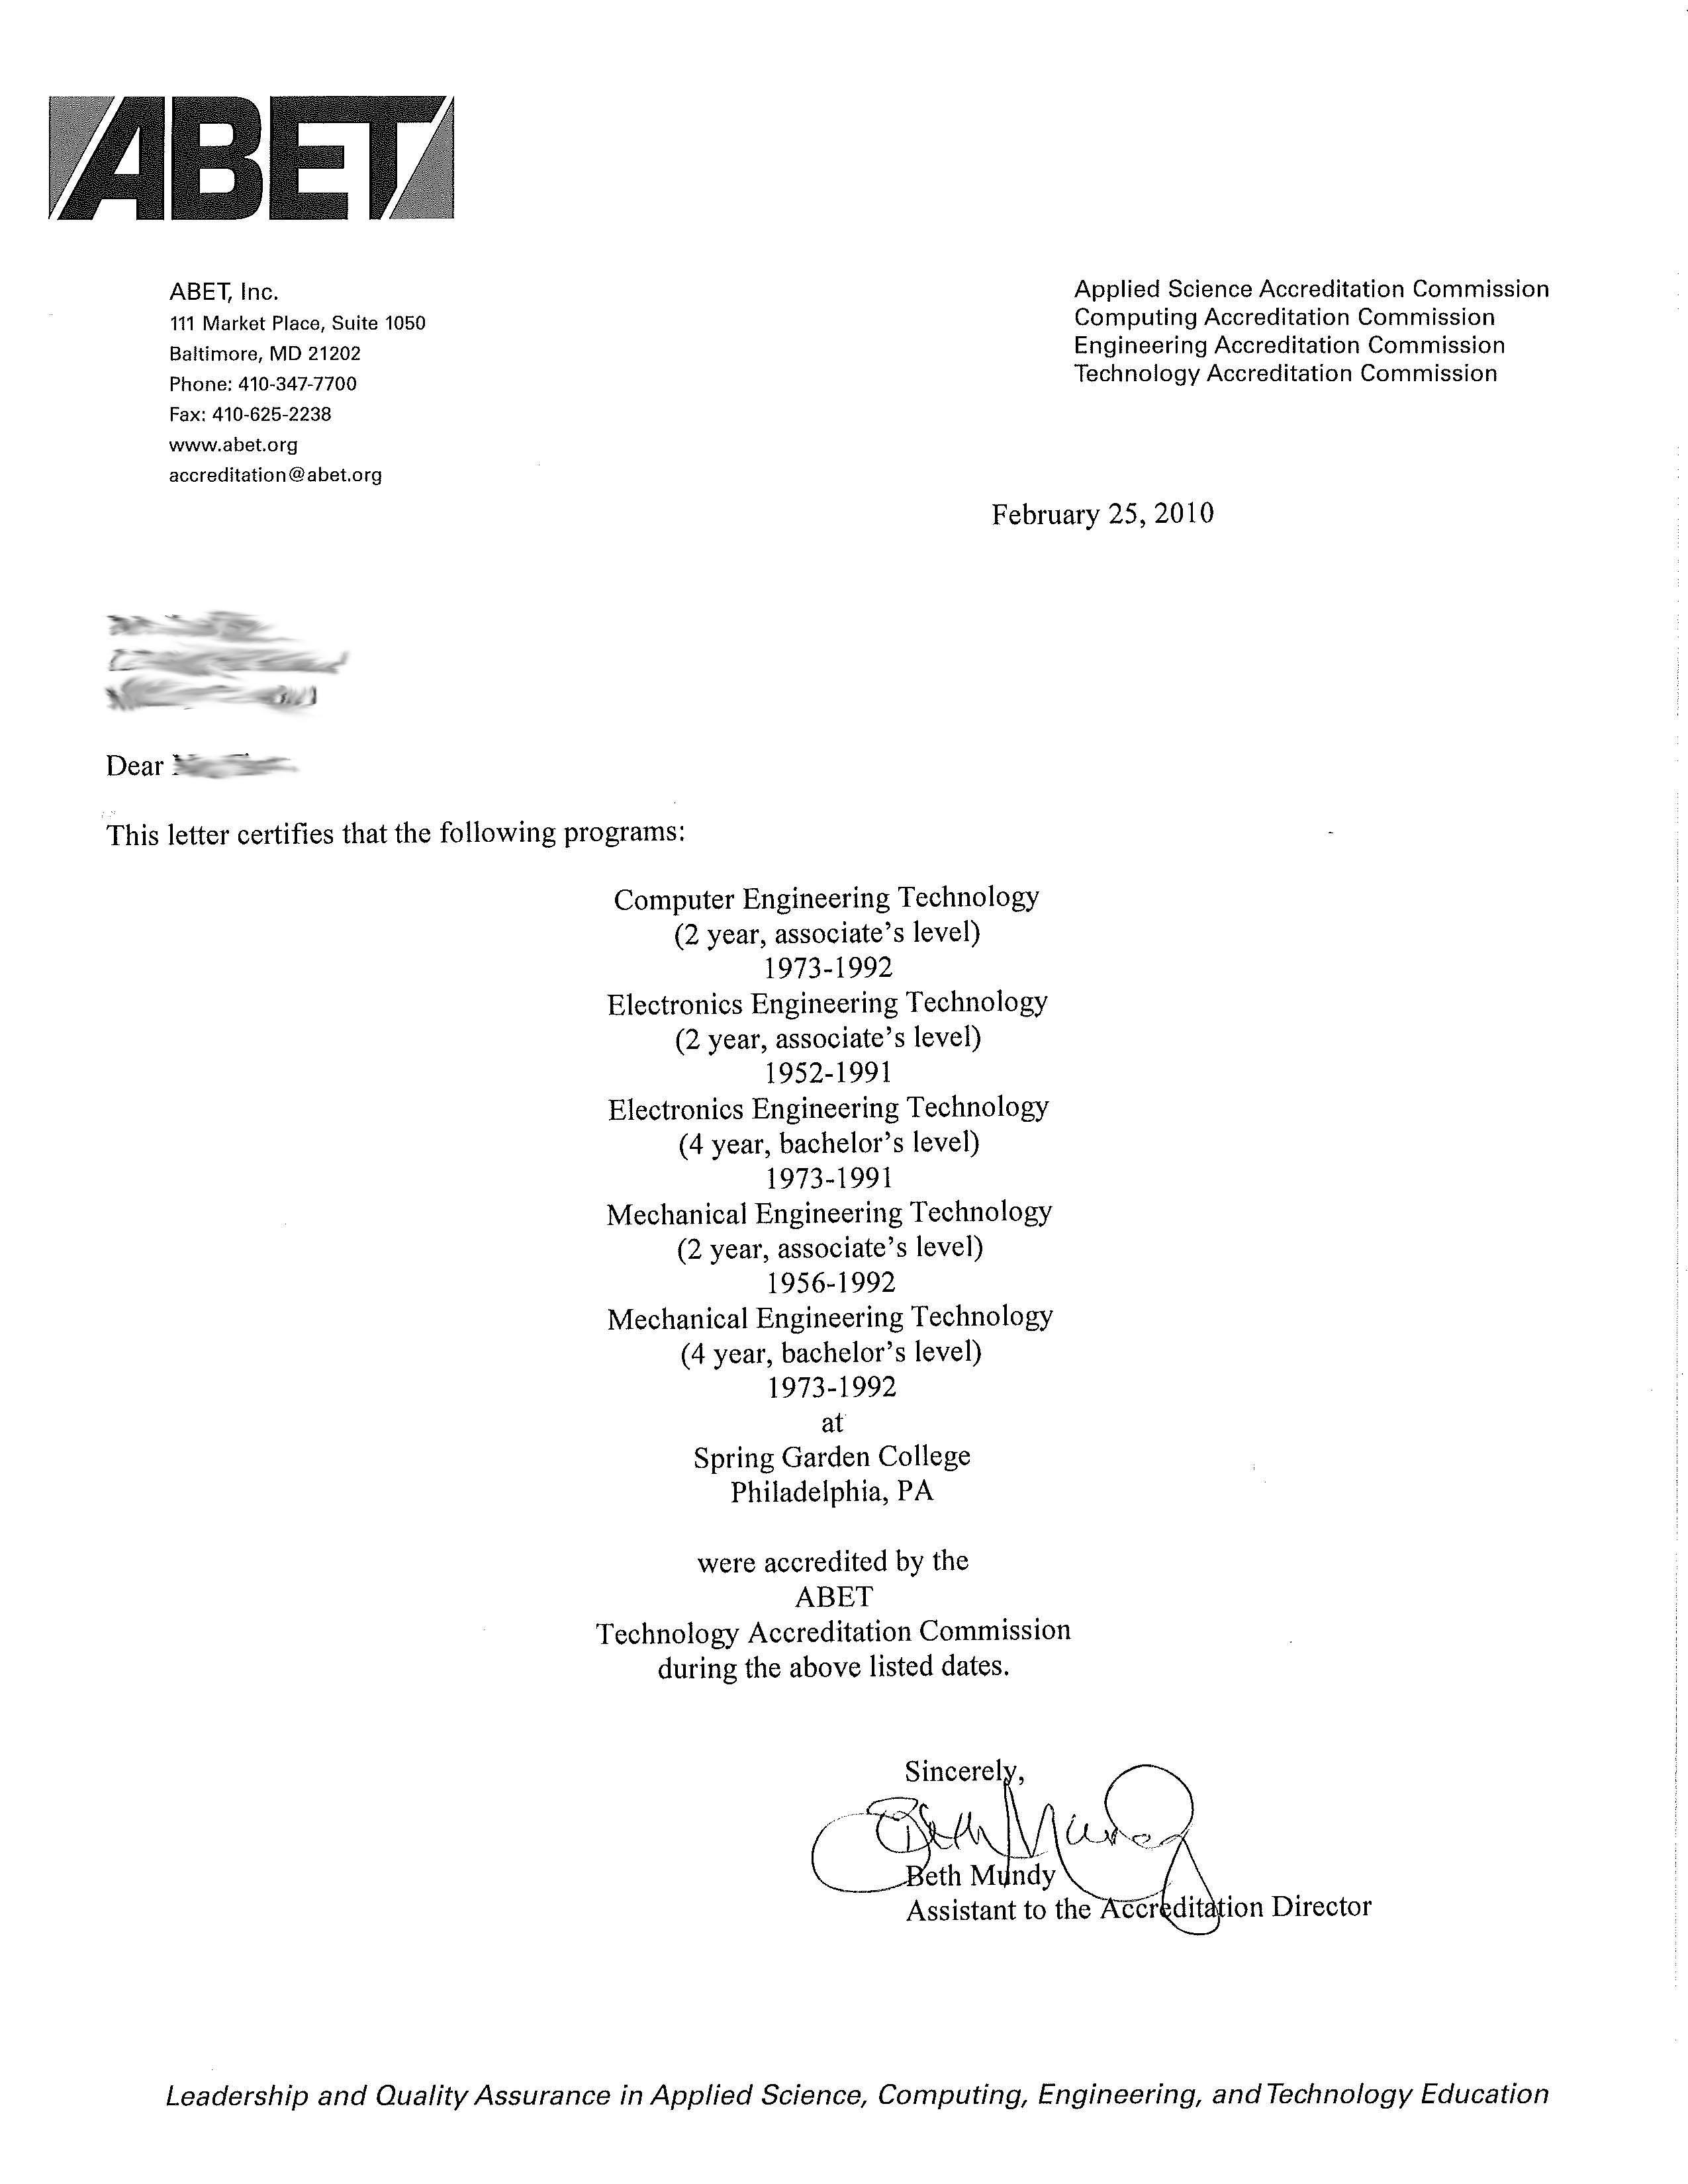 Spring garden college accreditation abet accreditation letter xflitez Images